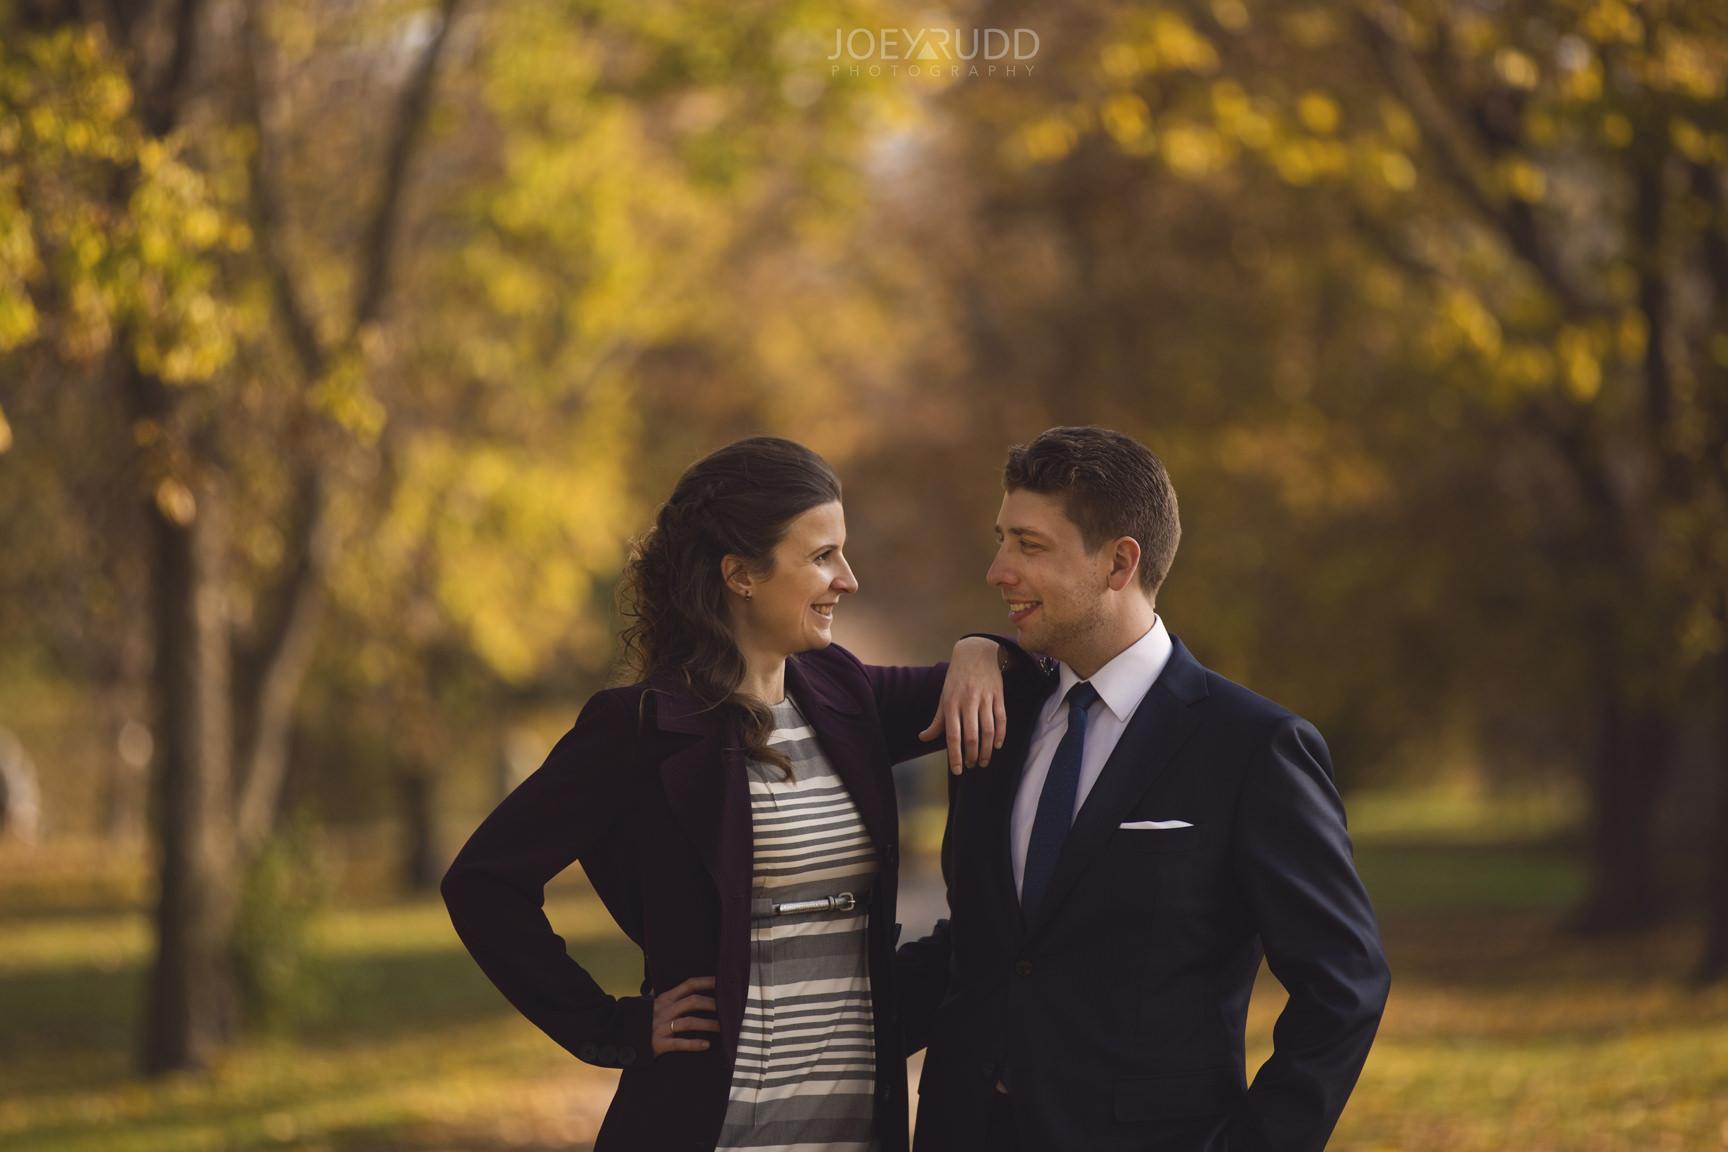 Ottawa Elopement by Joey Rudd Photography Ontario Wedding Photographer Fall Wedding